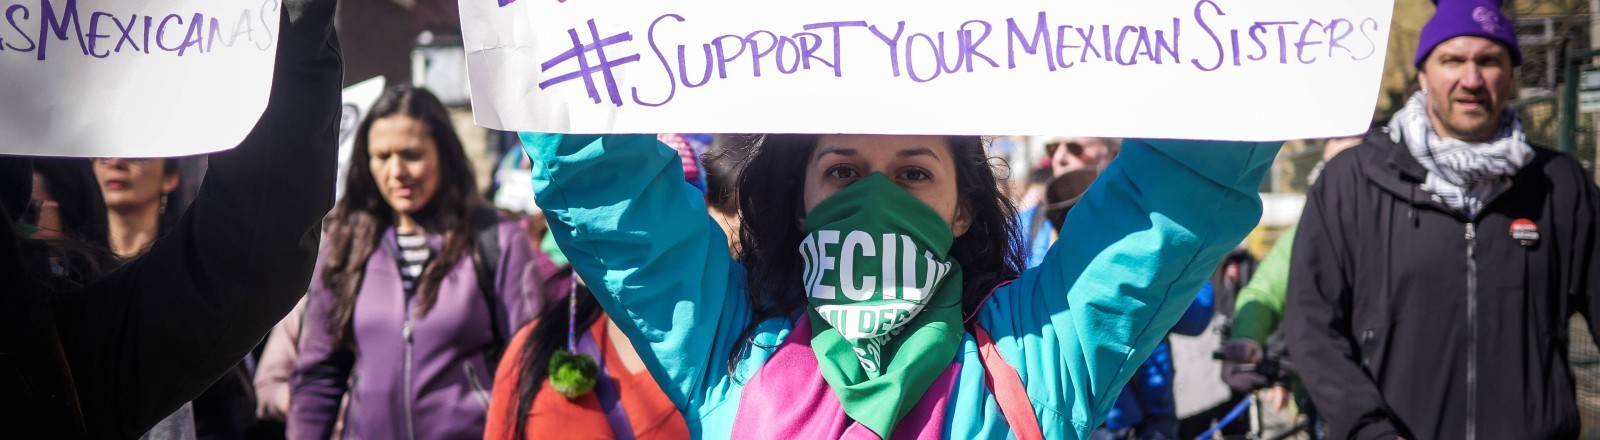 Eine Demonstrantin in Mexiko, die gegen die Frauenmorde demonstriert